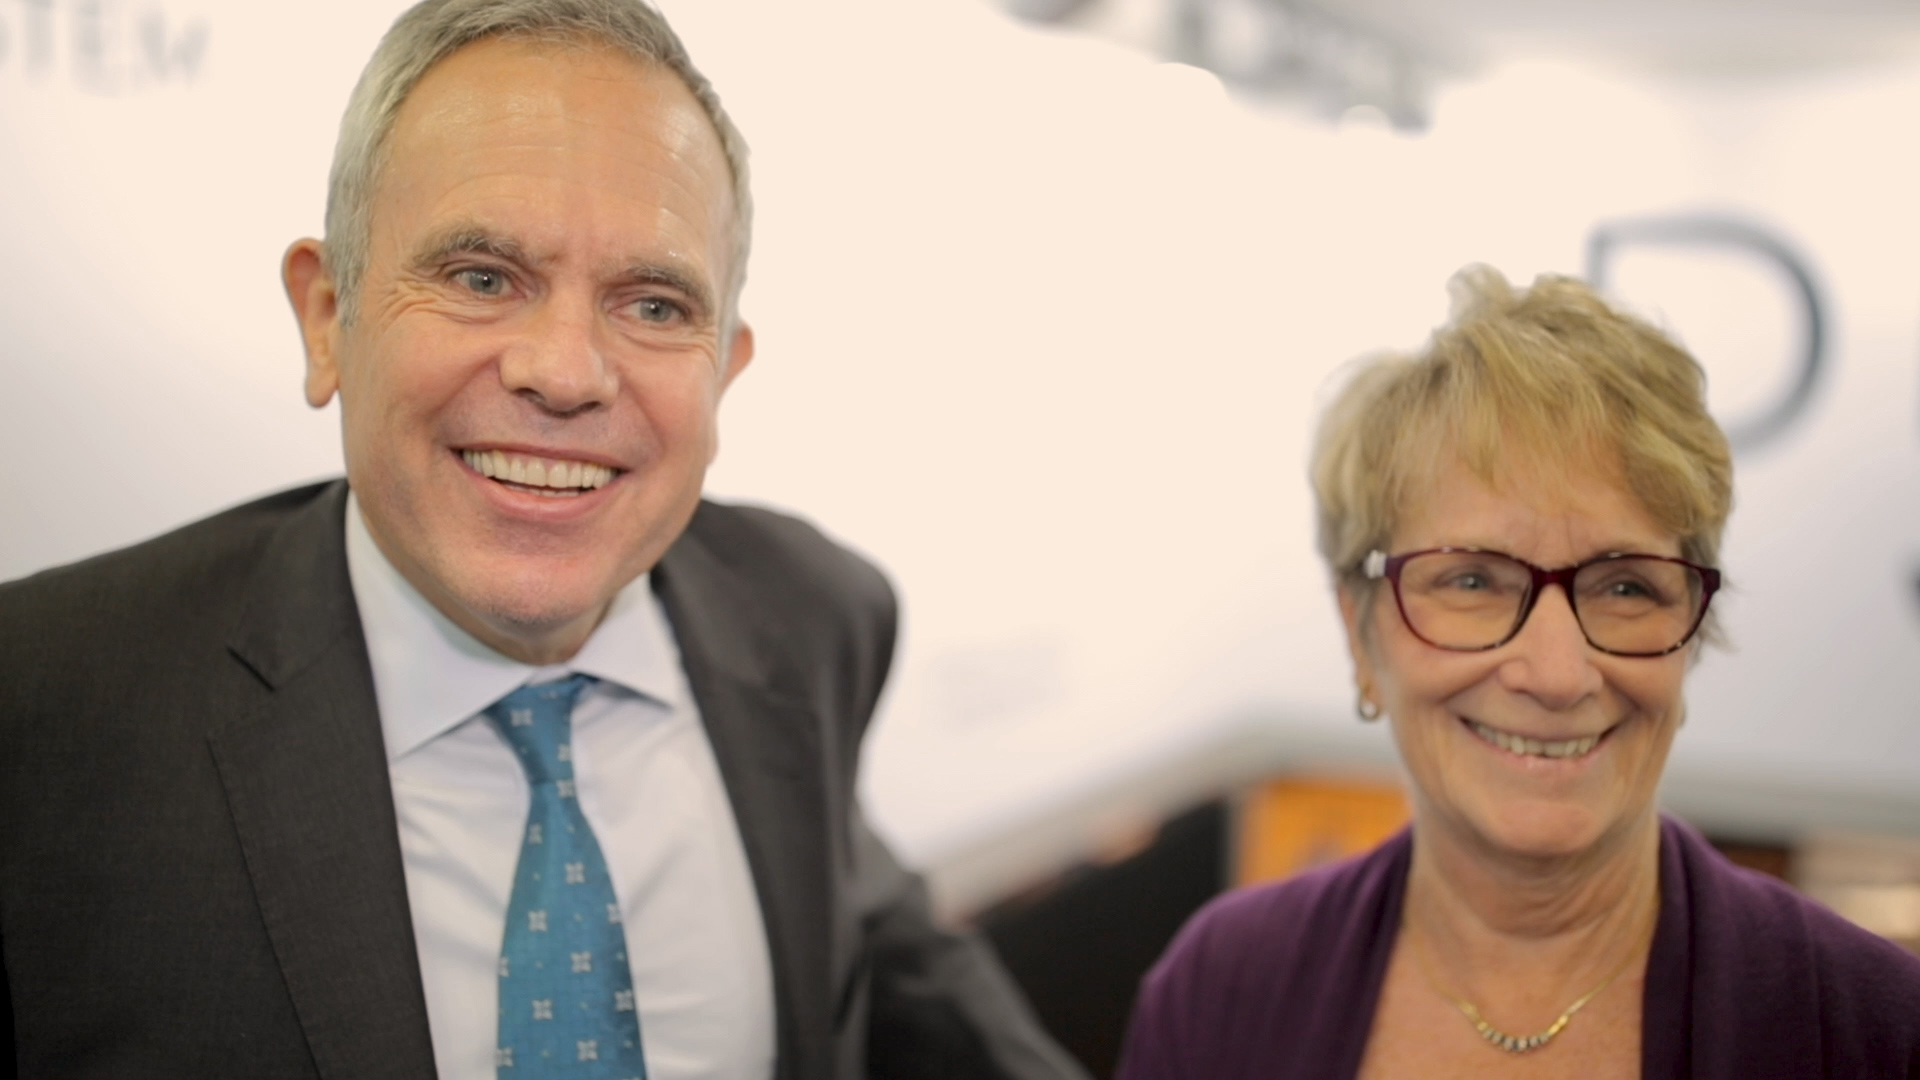 Robert Stabler to Manage Durst/Koenig & Bauer Joint Venture